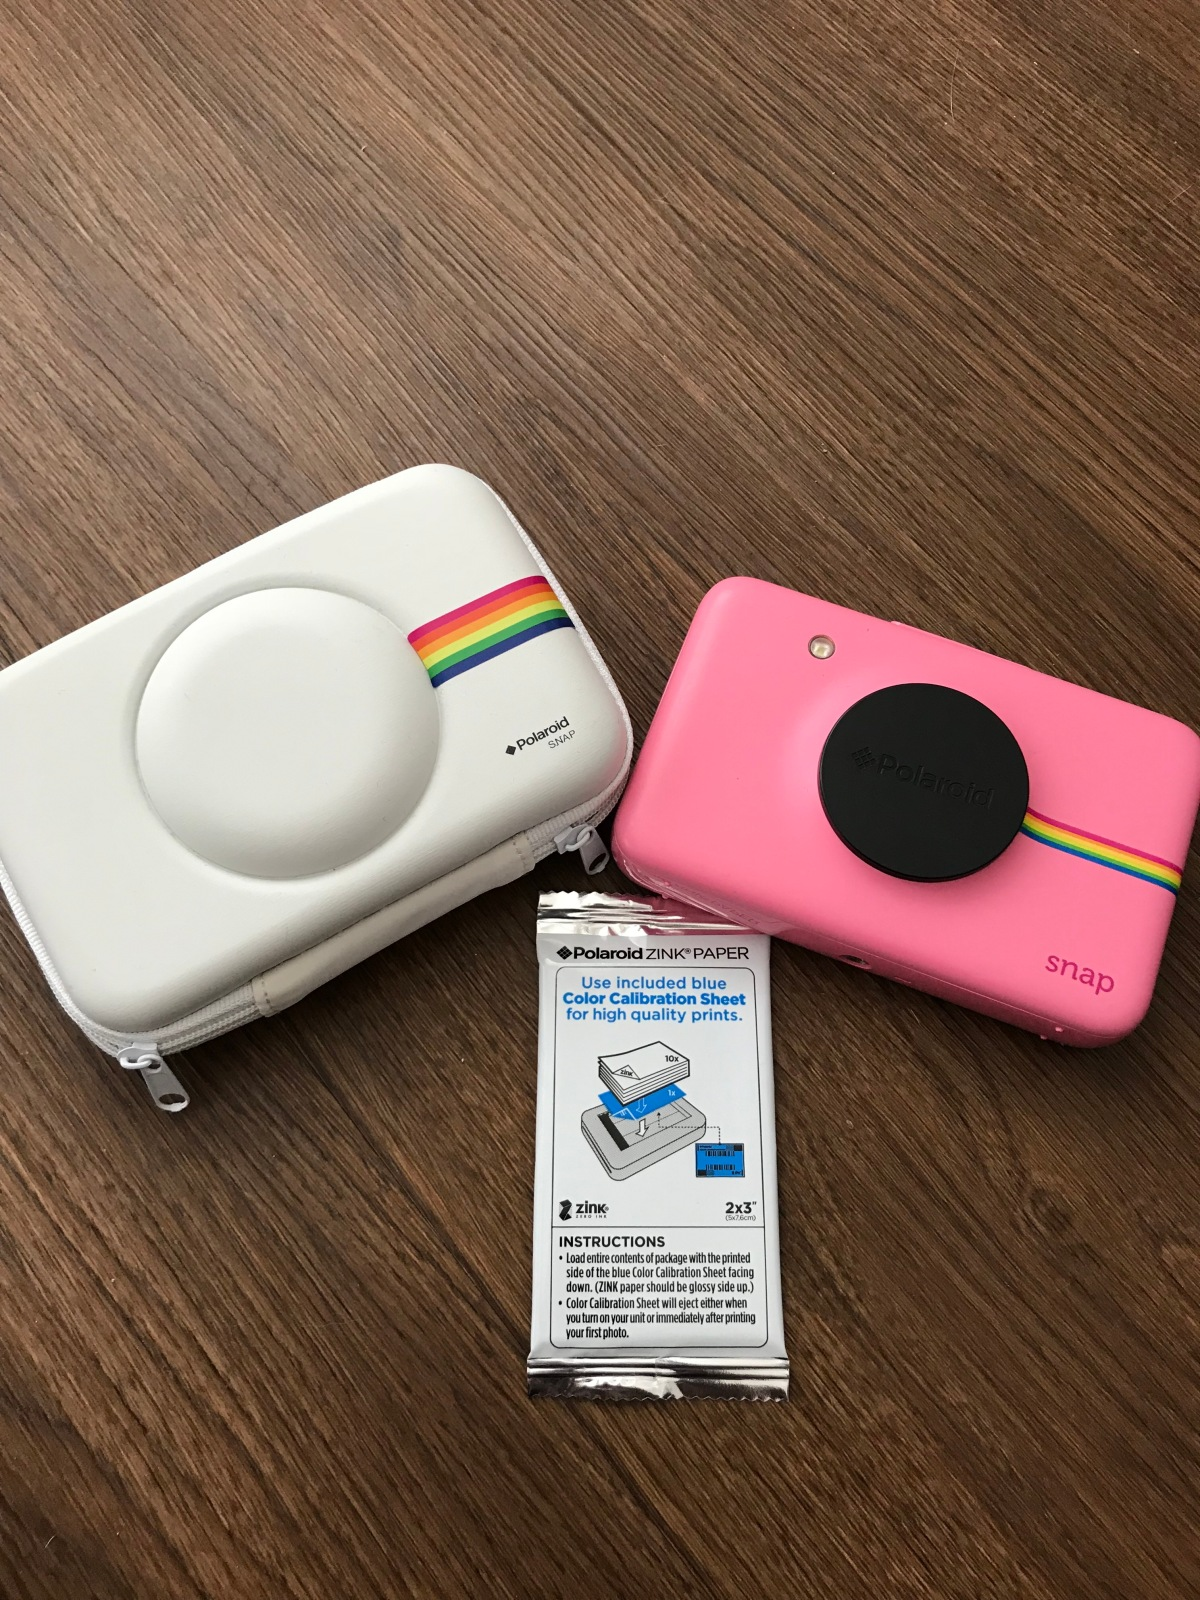 Polaroid Snap InstantCamera